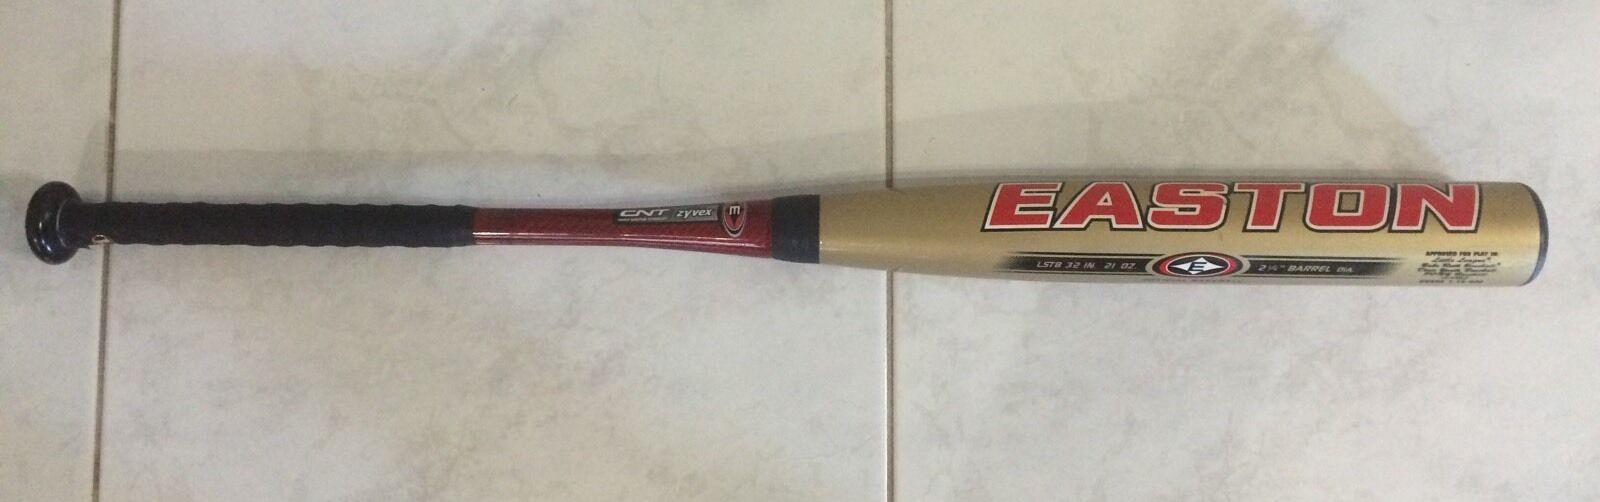 Easton Stealth Sc900 Youth Baseball Bat